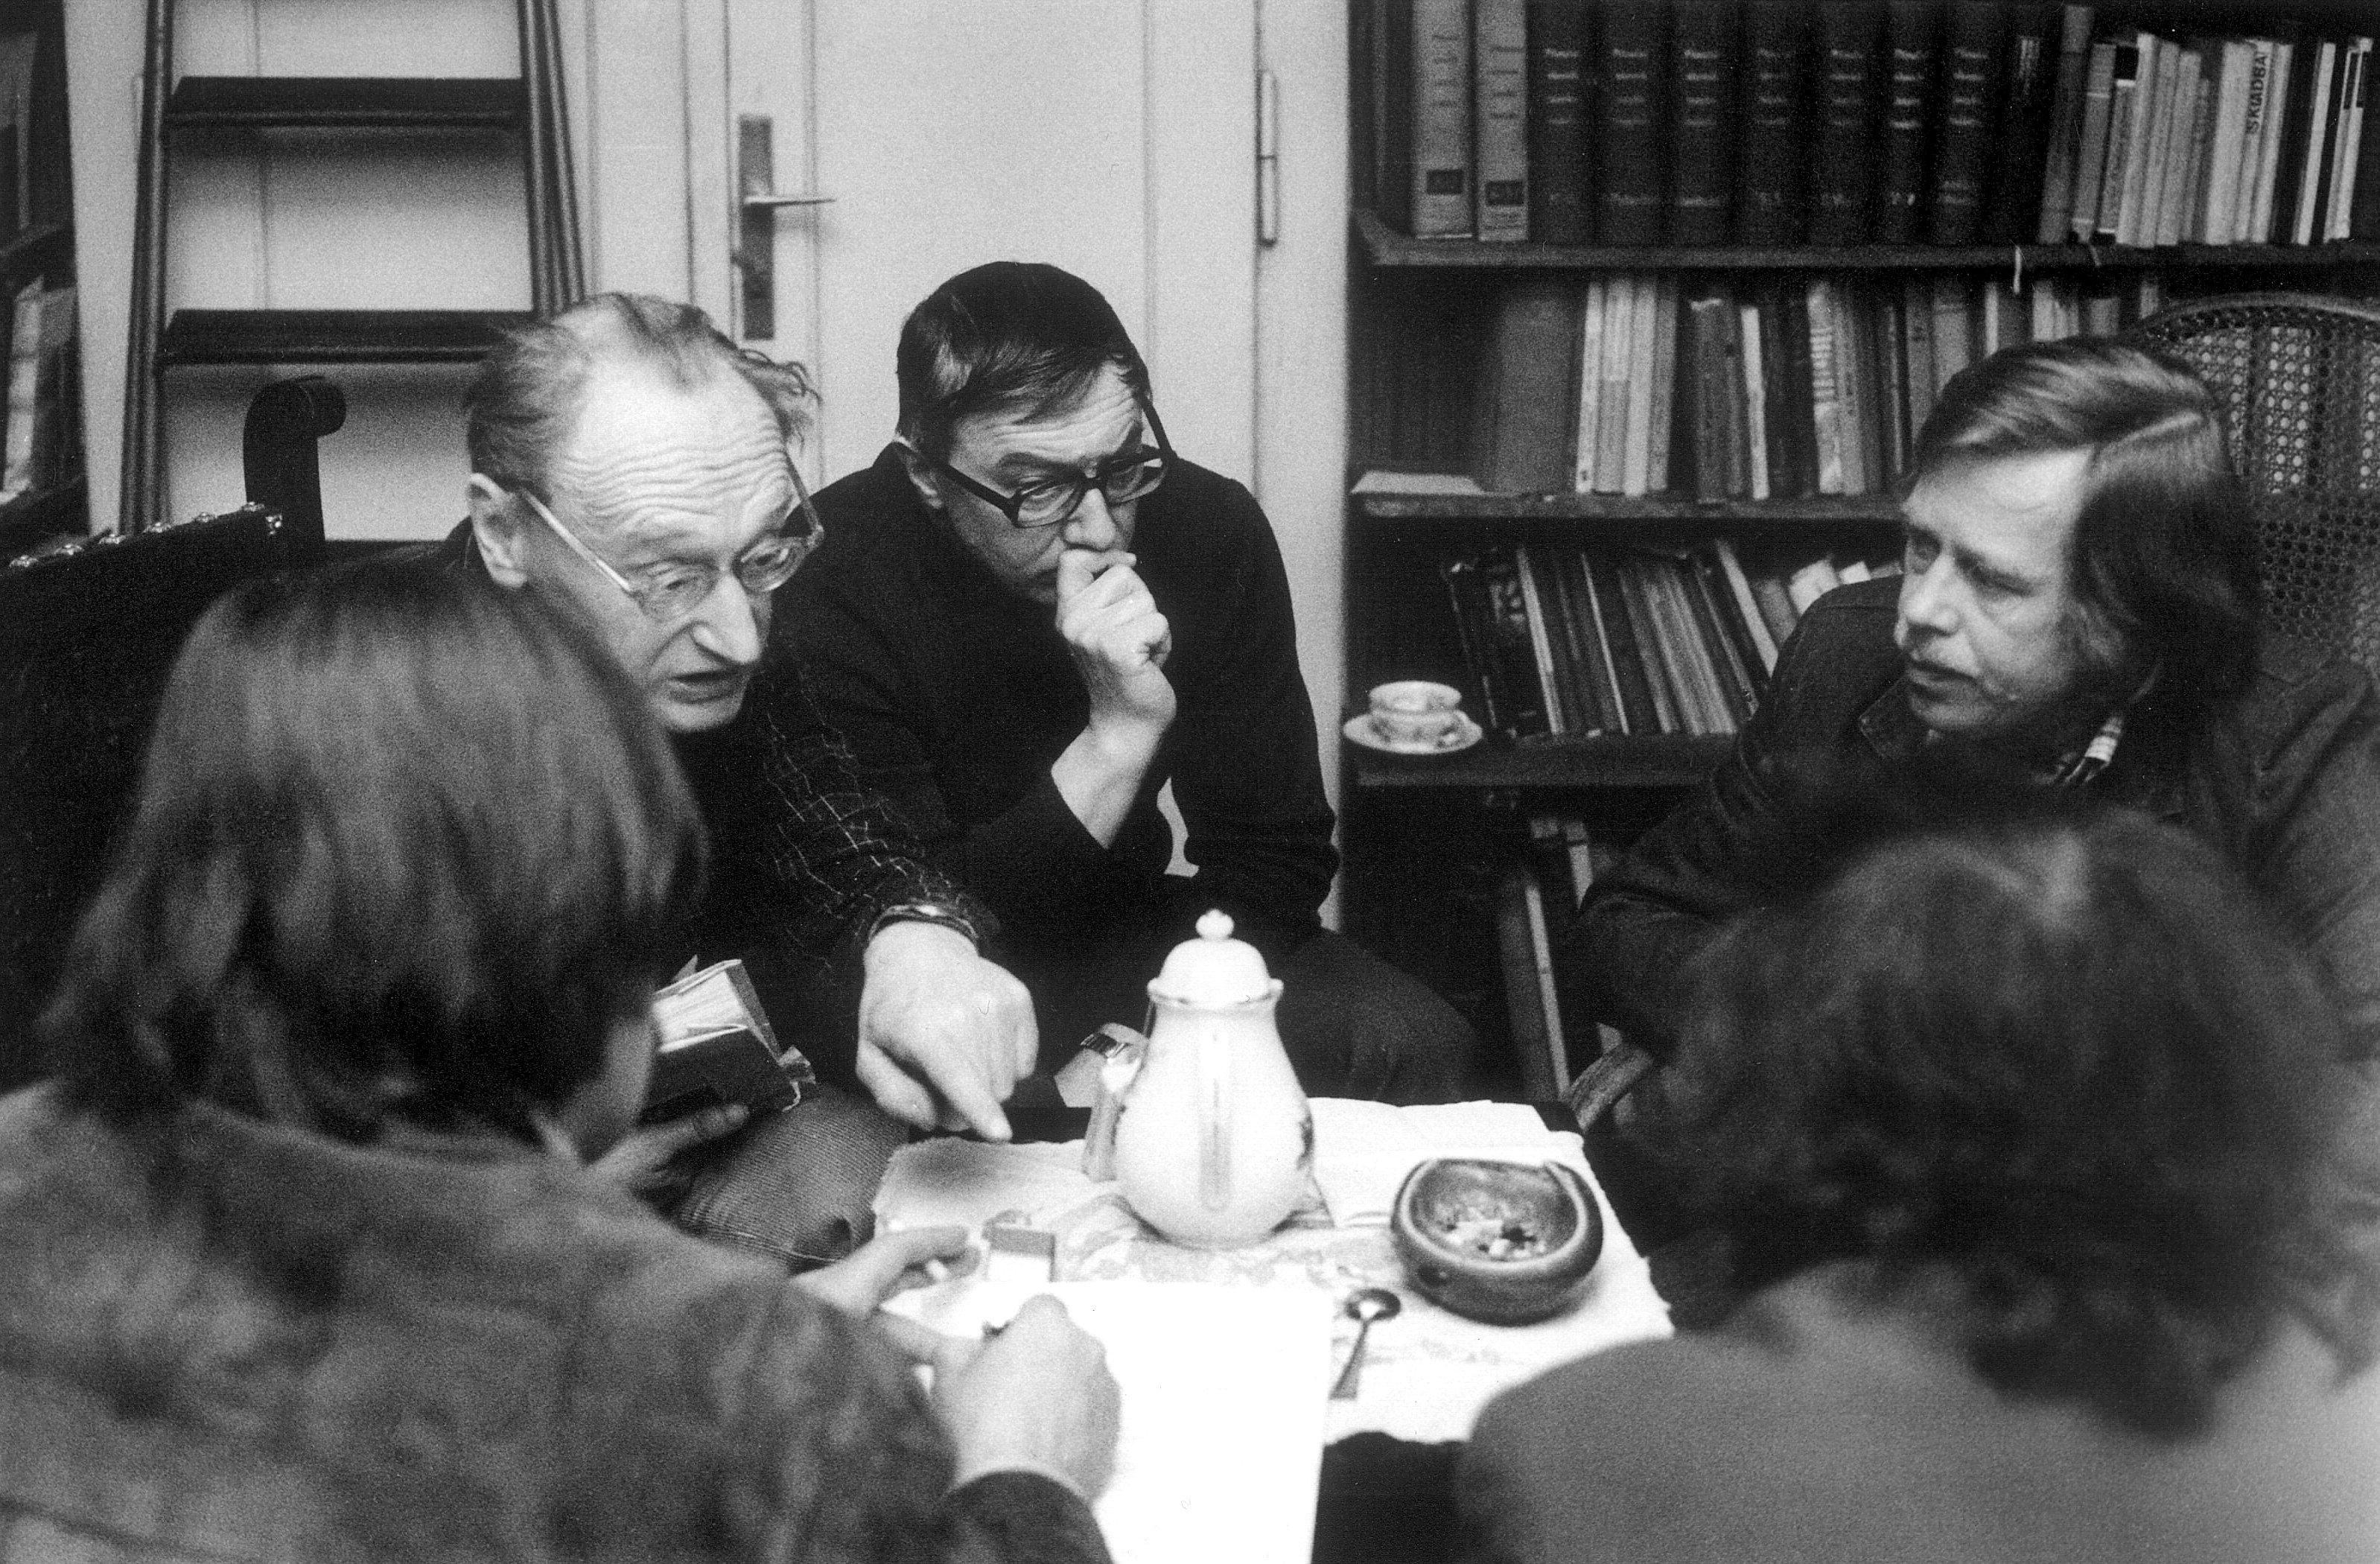 Jiří Hájek, Ladislav Hejdánek, Václav Havel (1979)